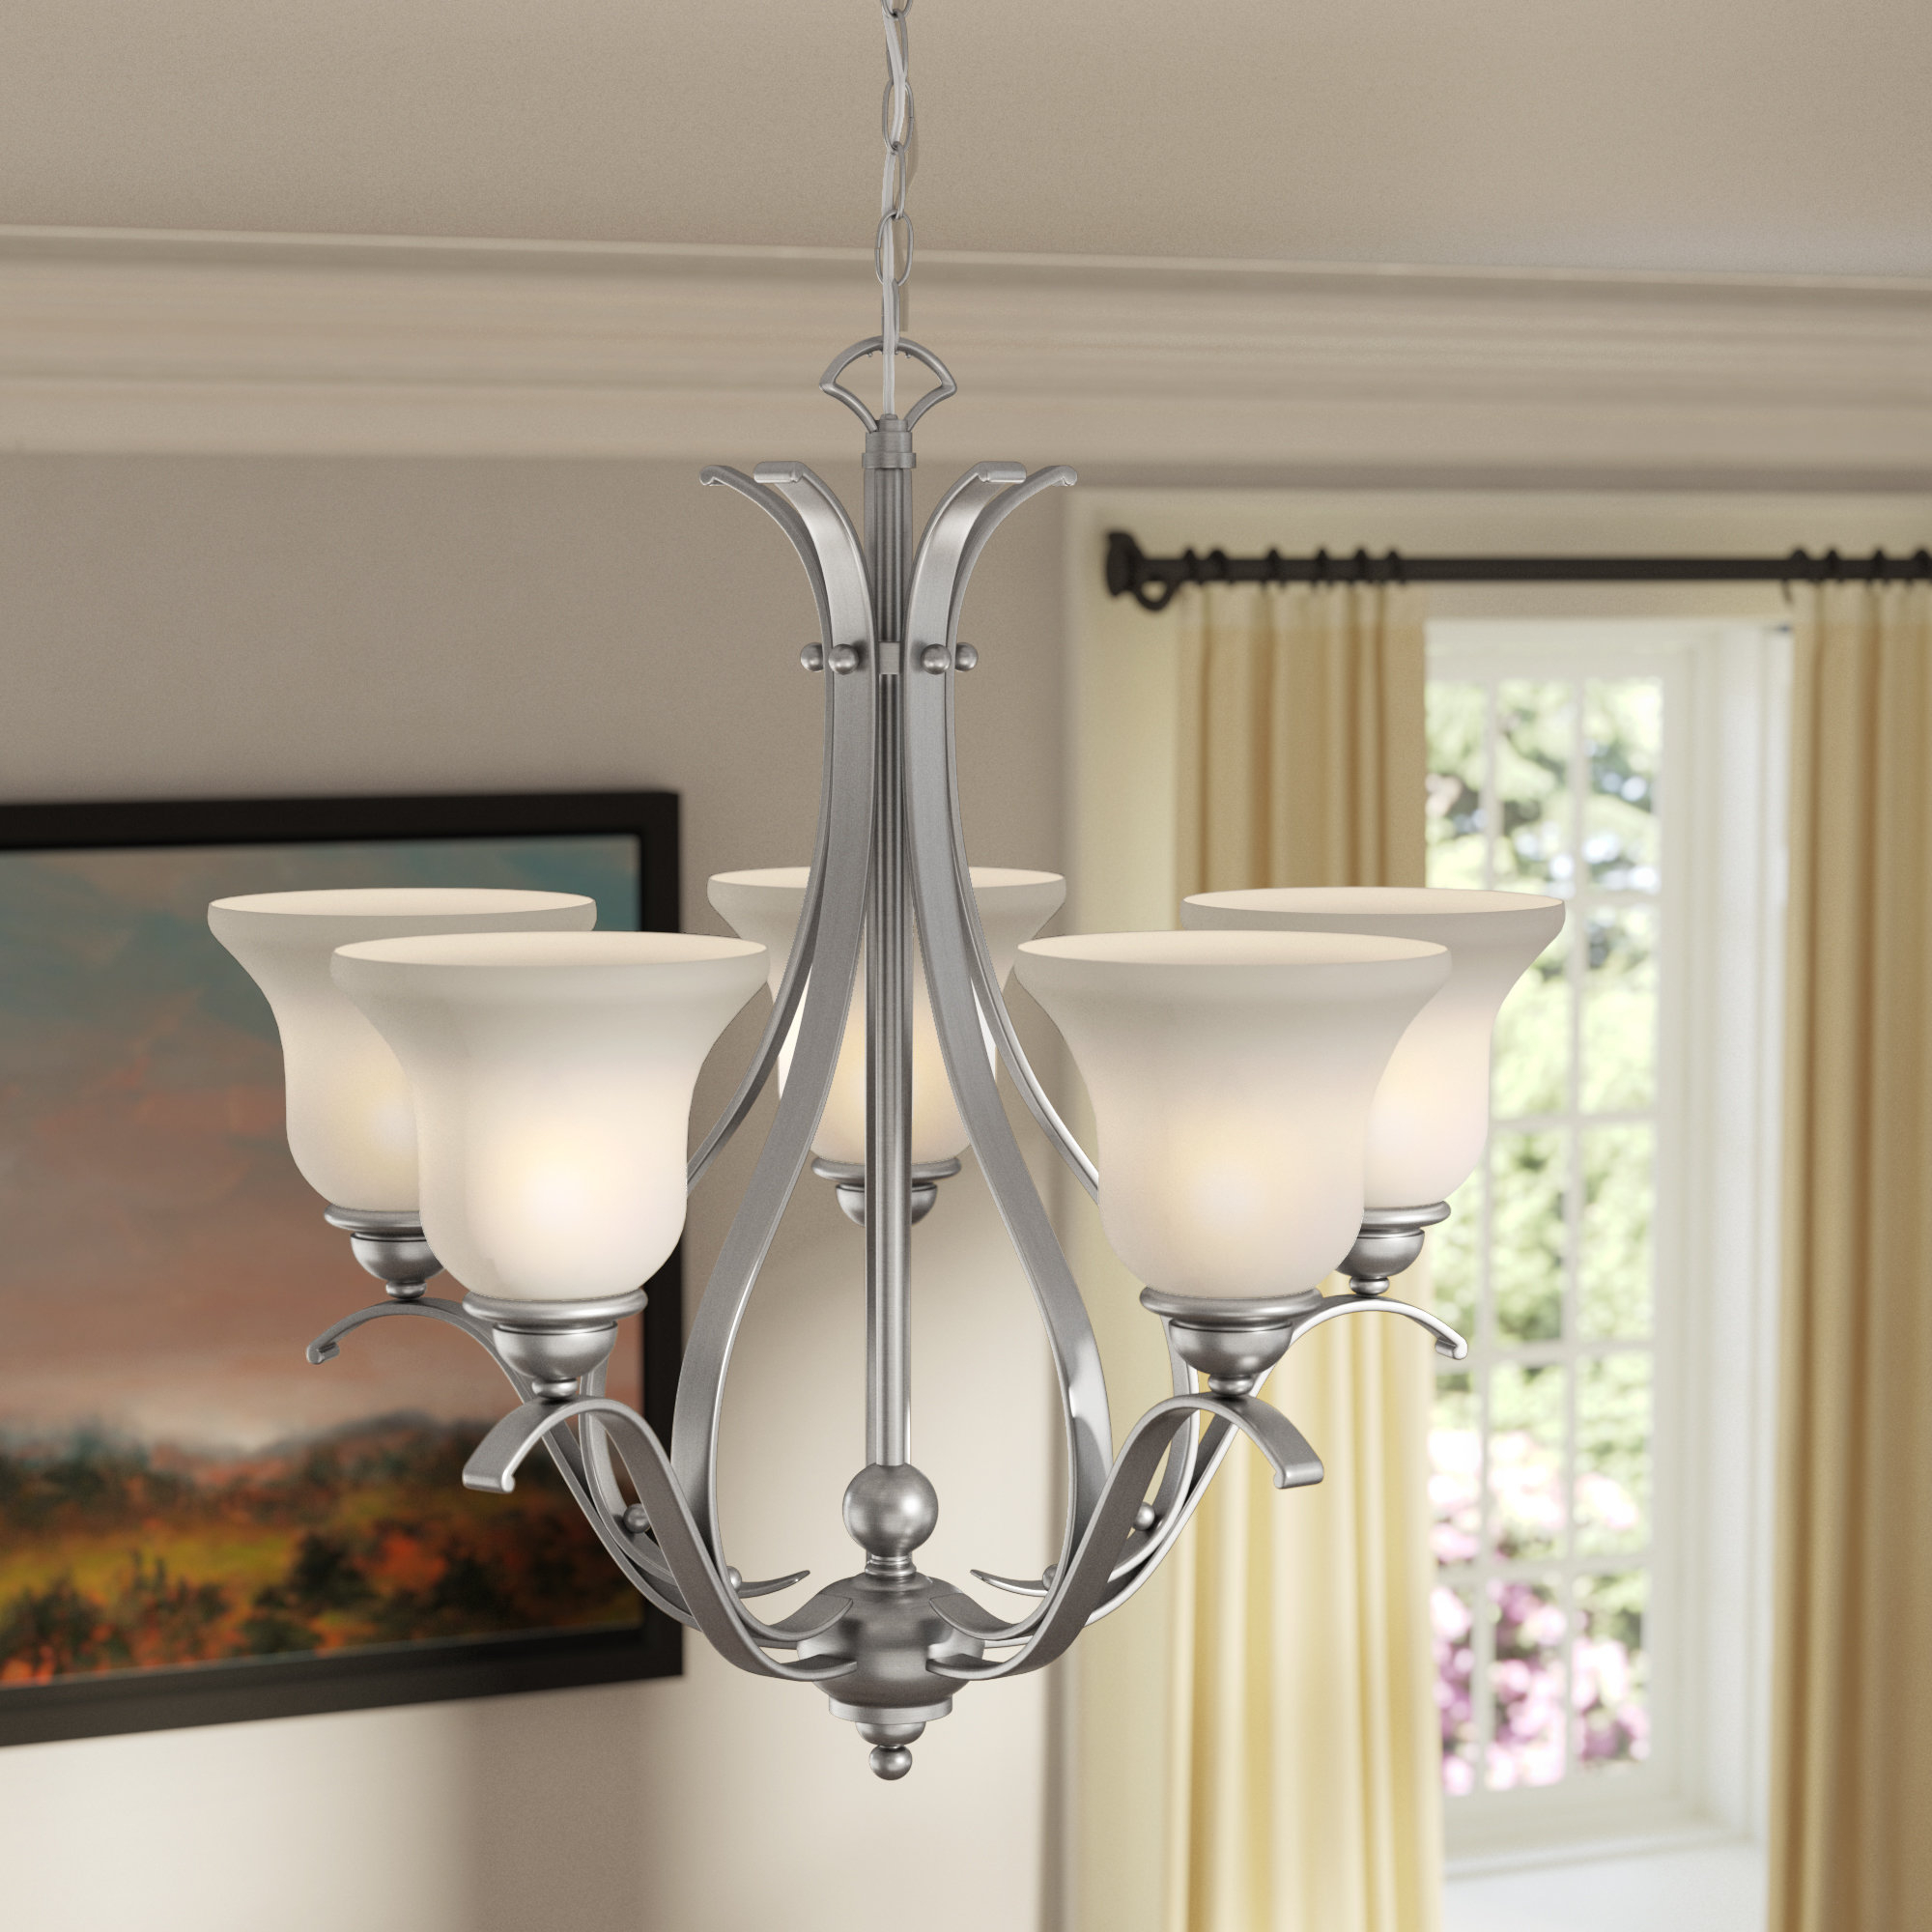 Van Horne 5 Light Shaded Chandelier With Well Known Van Horne 3 Light Single Teardrop Pendants (View 20 of 25)